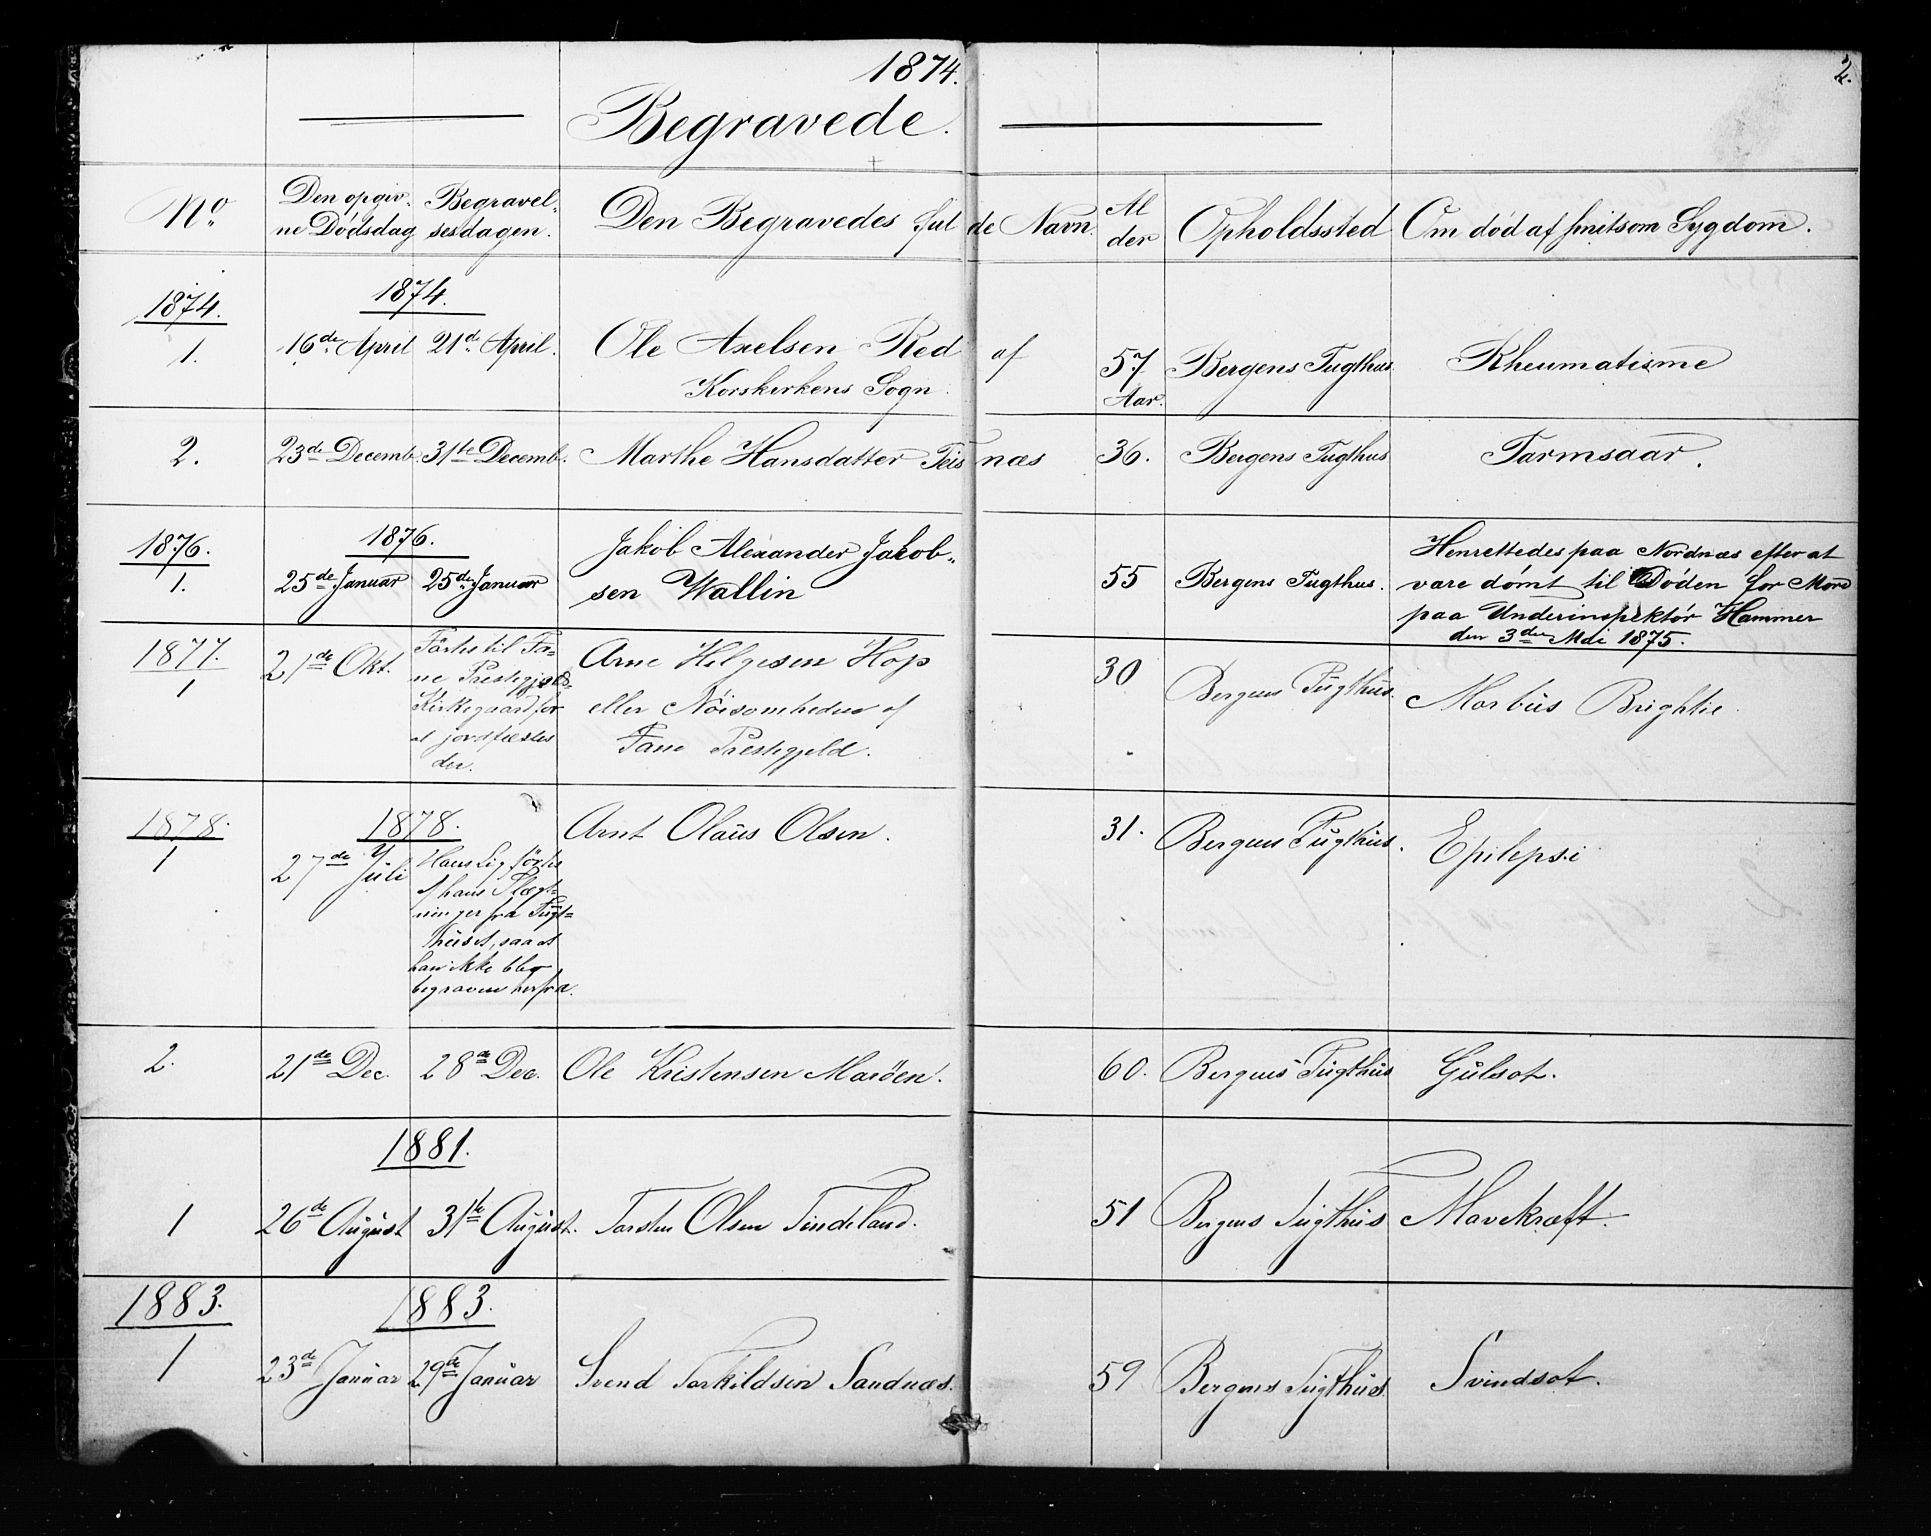 SAB, Bergens strafanstalts sokneprestembete*, Klokkerbok nr. A 1, 1874-1884, s. 2